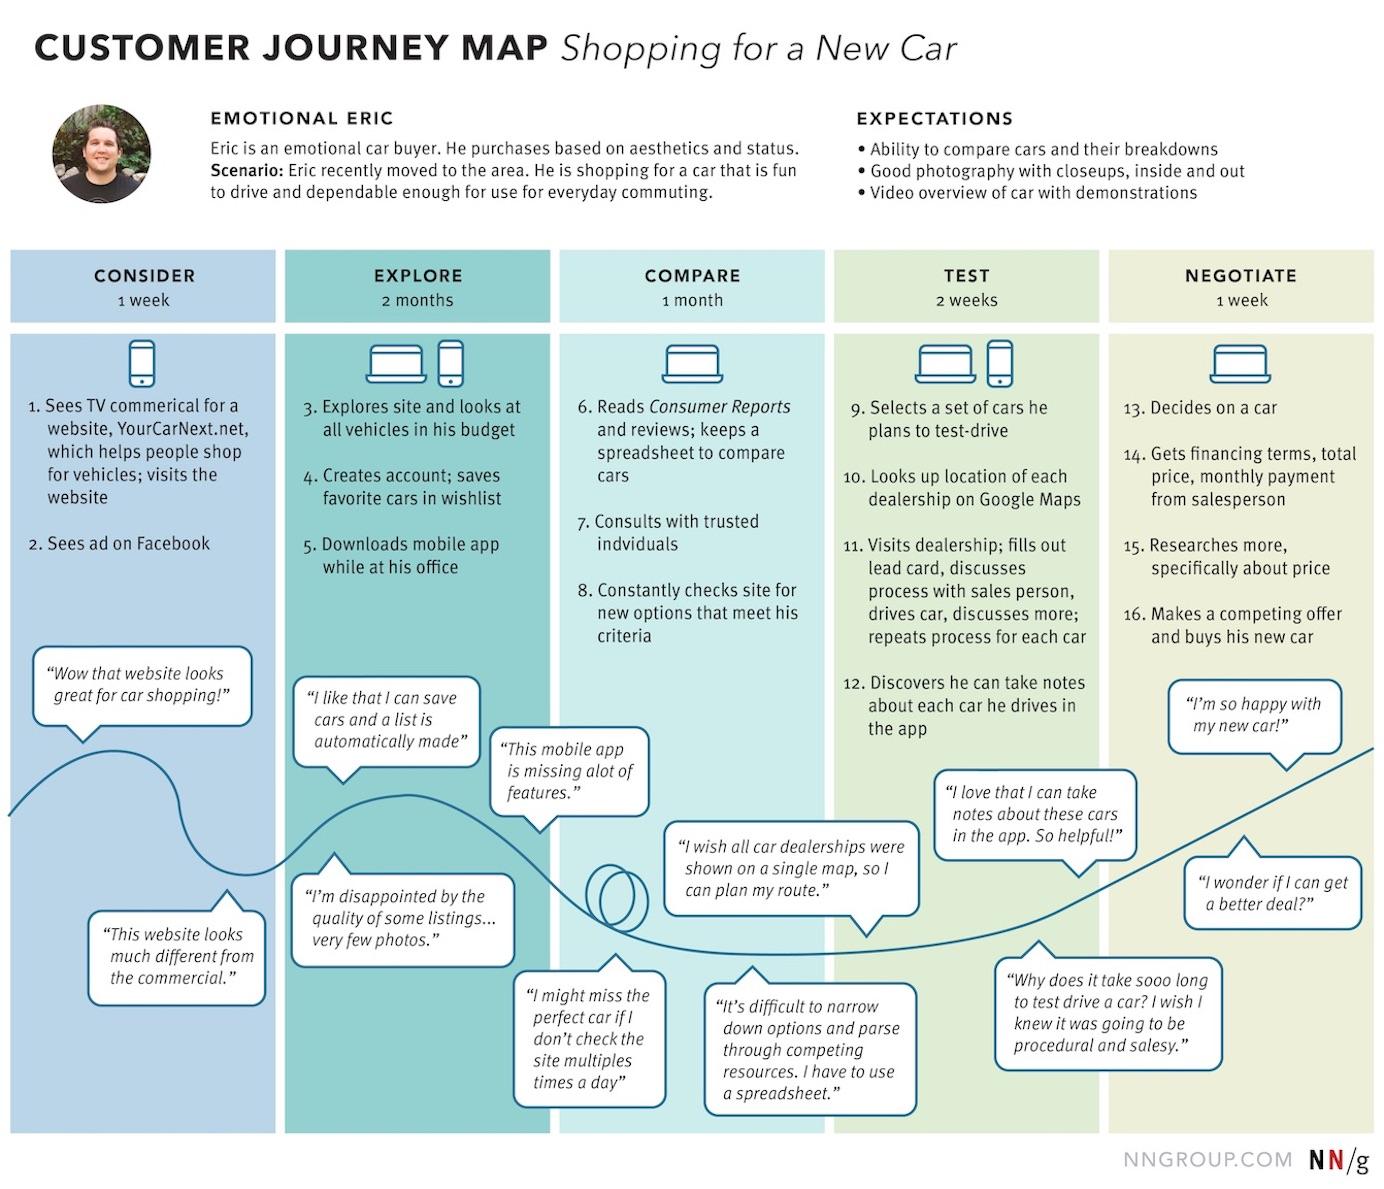 Customer Journey Map - New Car Shopping